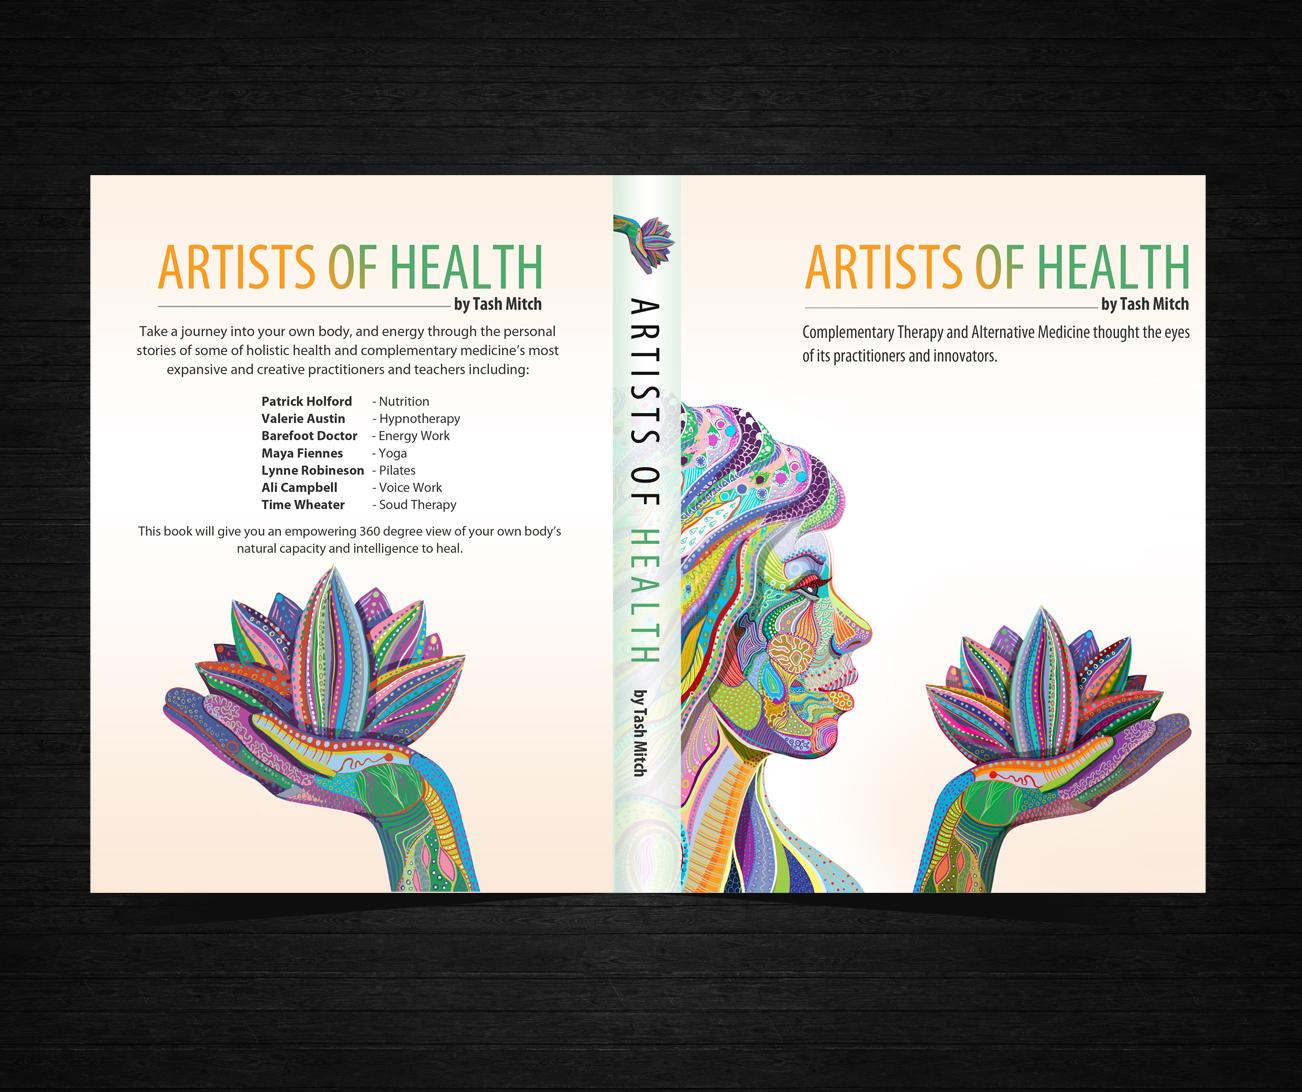 Modern Book Cover Uk : Elegant modern book cover design for tash mitch by uk